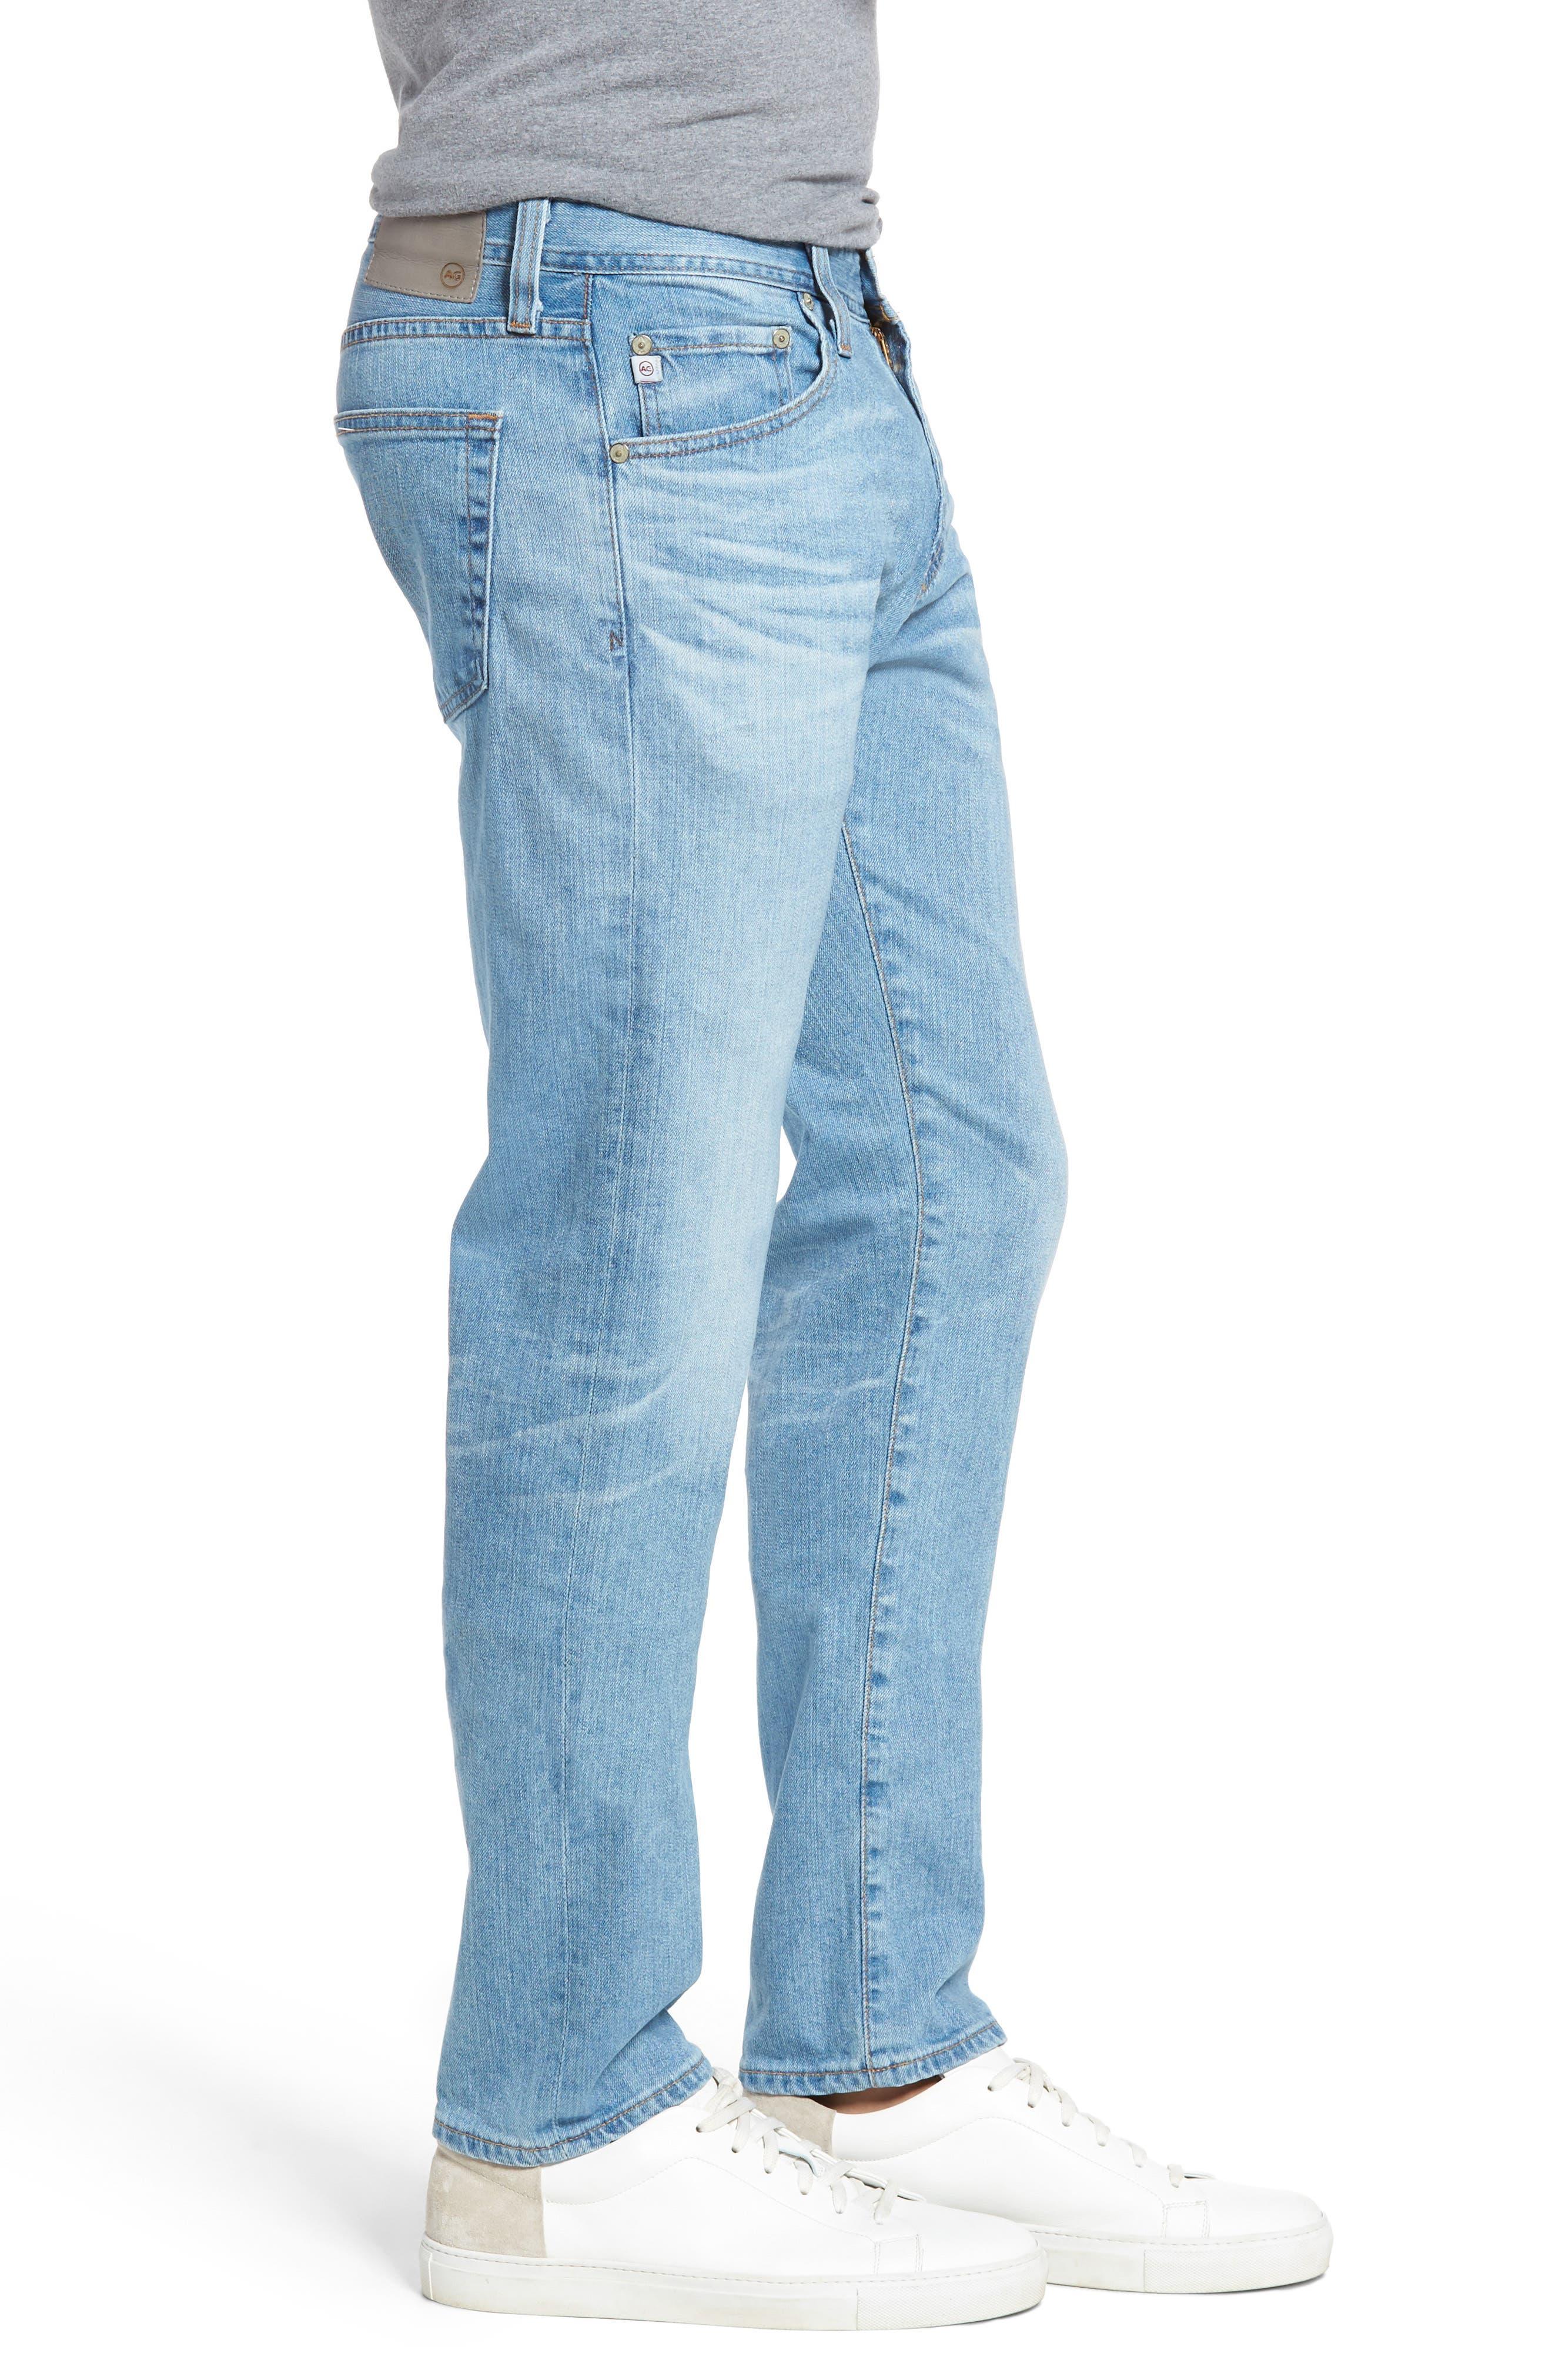 Tellis Slim Fit Jeans,                             Alternate thumbnail 3, color,                             412